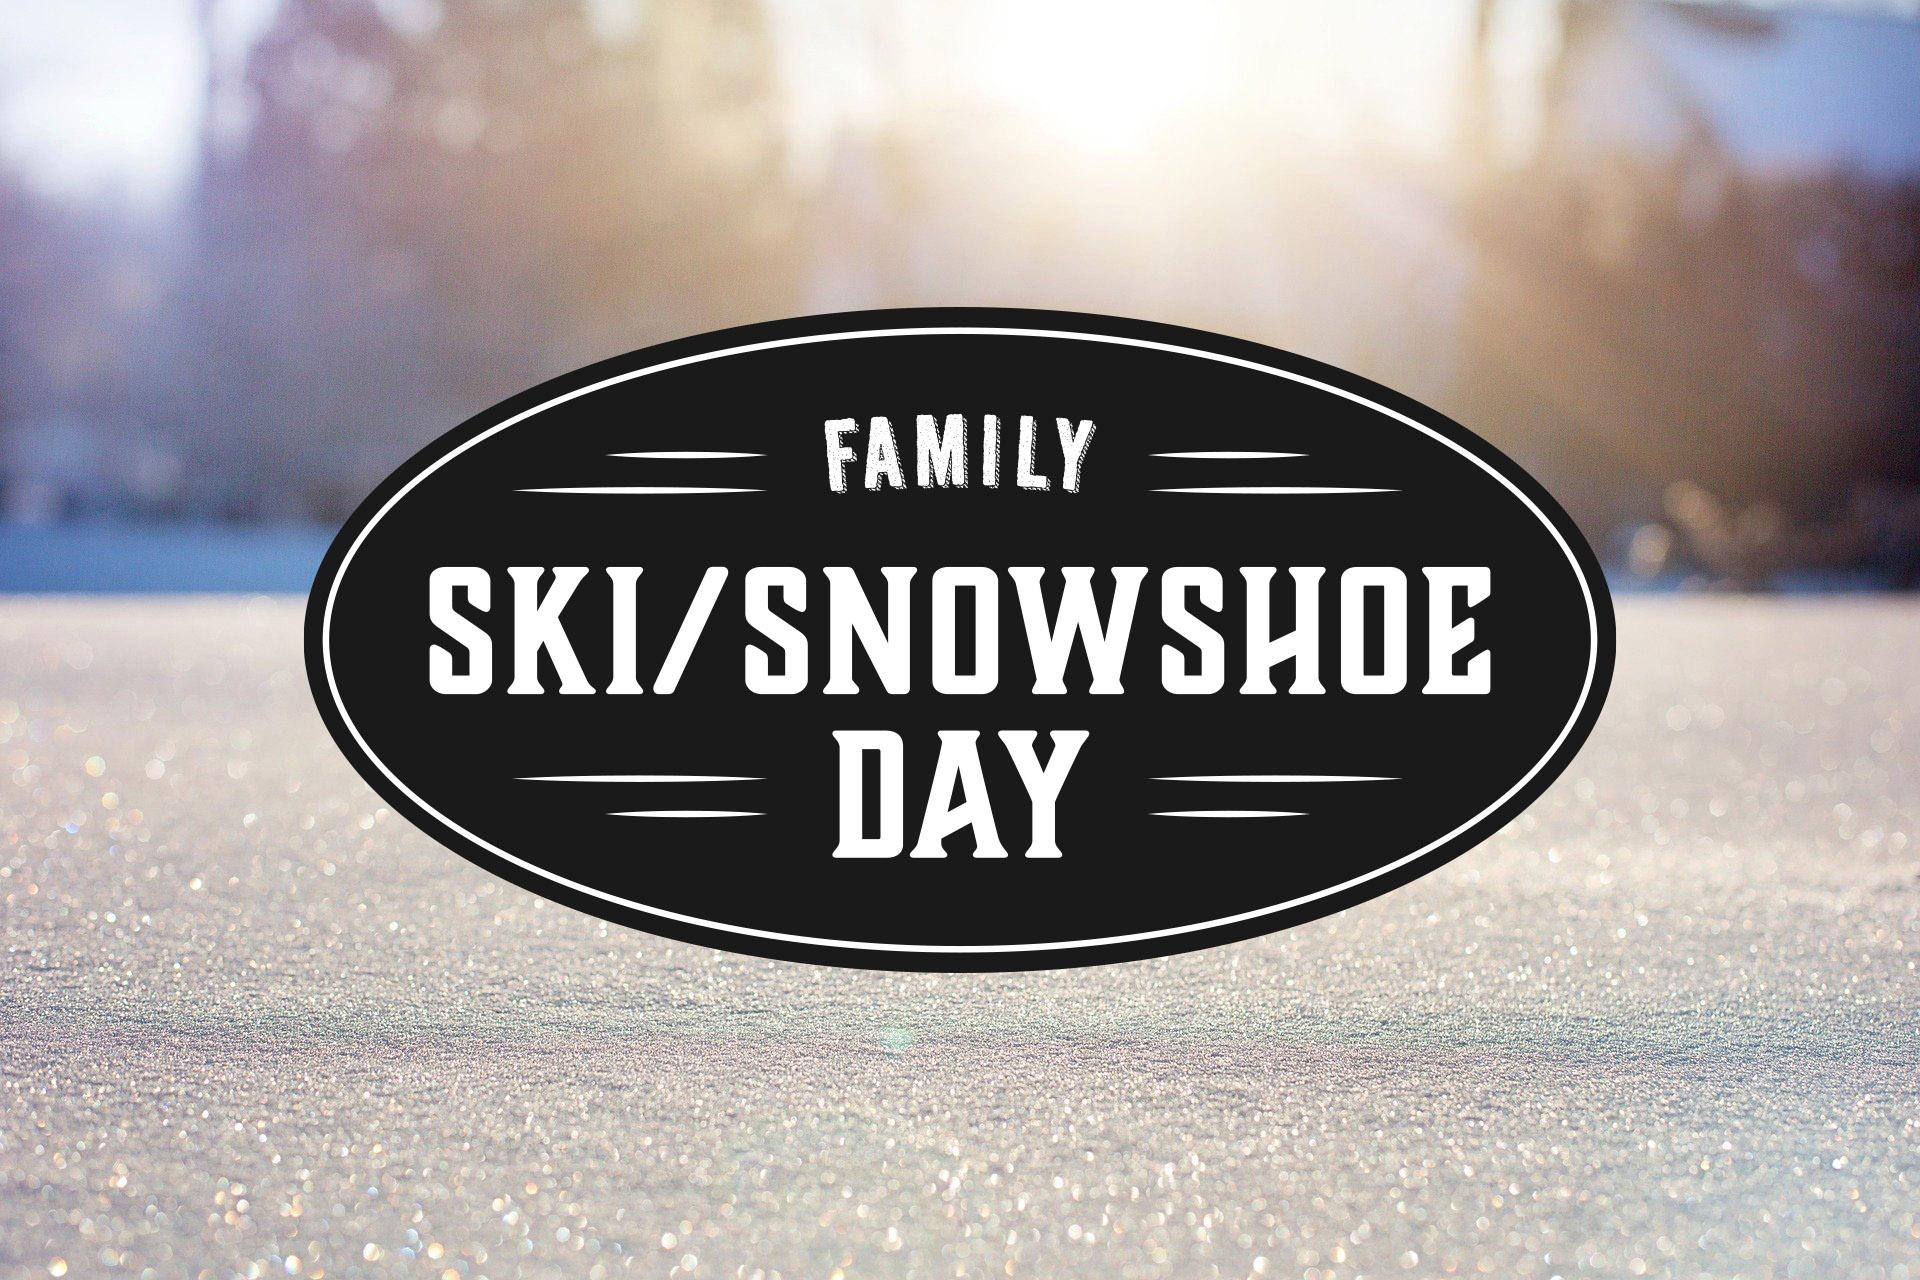 Family Ski/Snowshoe Day